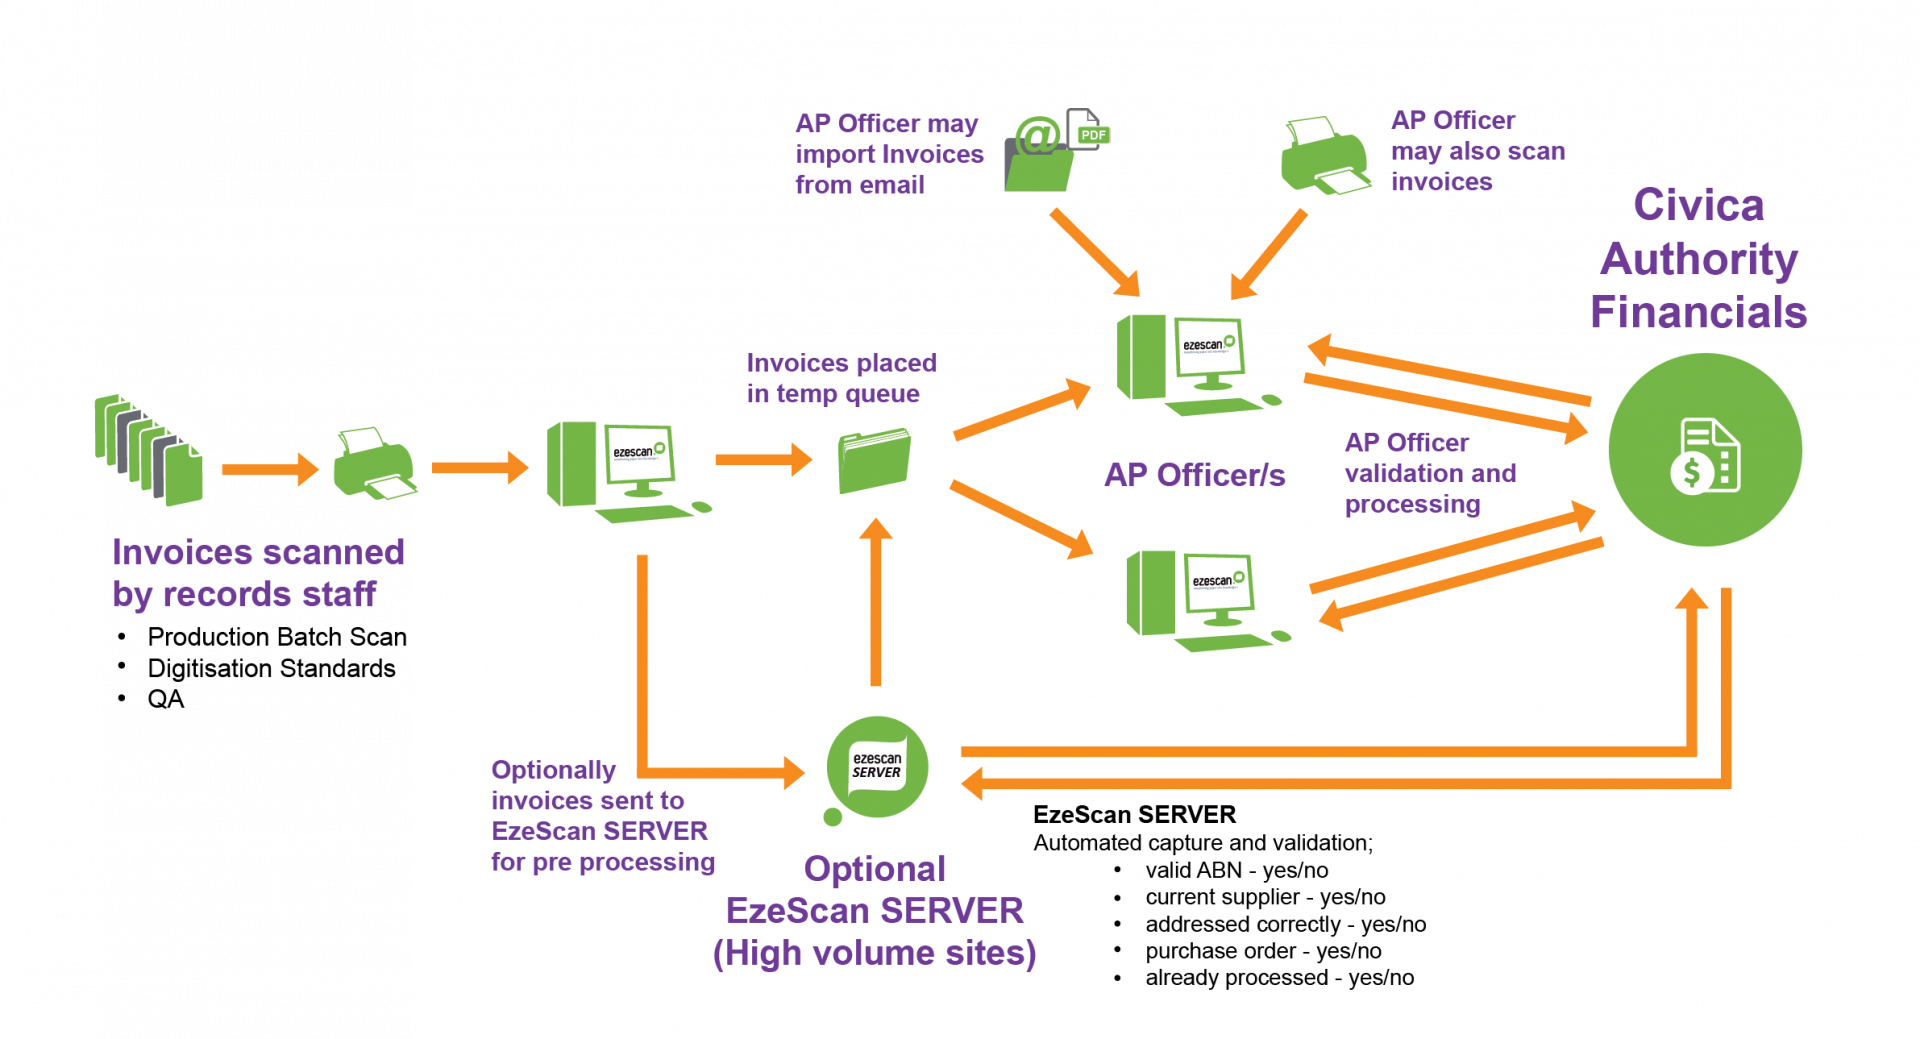 EzeScan Civica Authority Financials Diagram